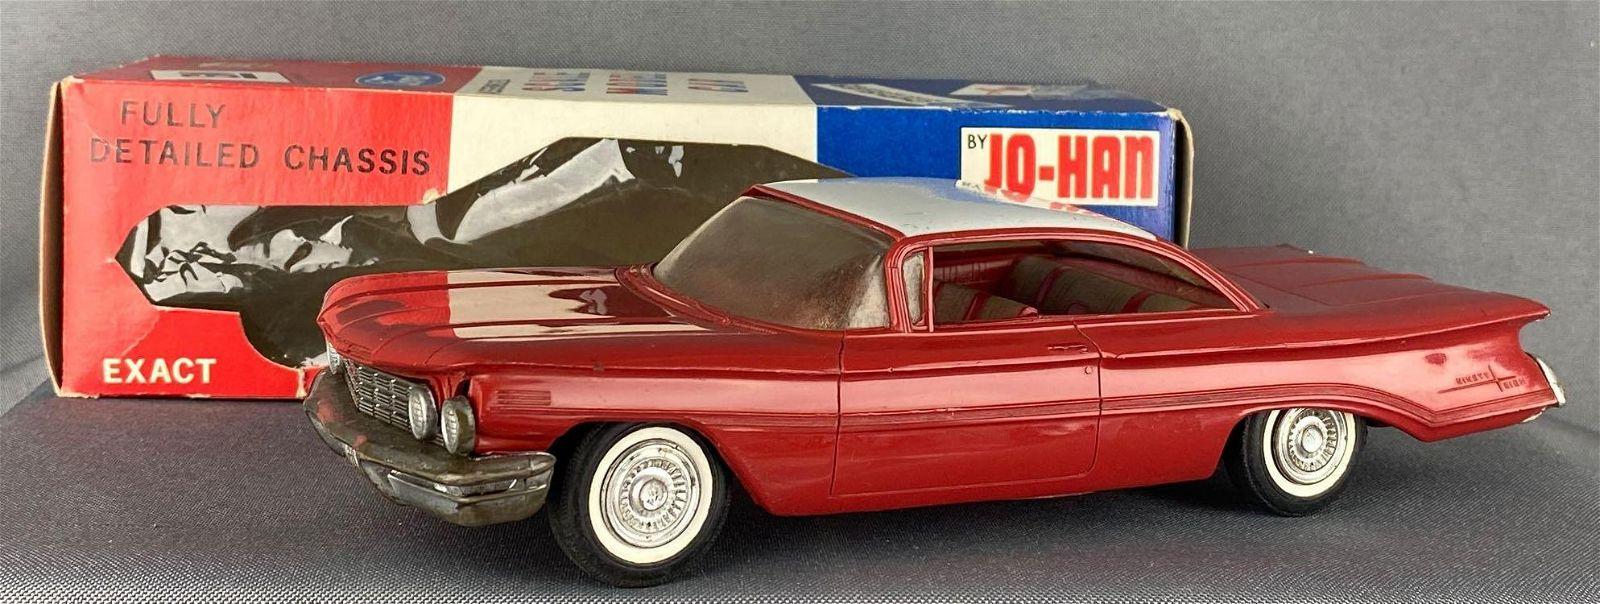 Jo-Han Models 1960 Oldsmobile 98 Dealer Promo Car